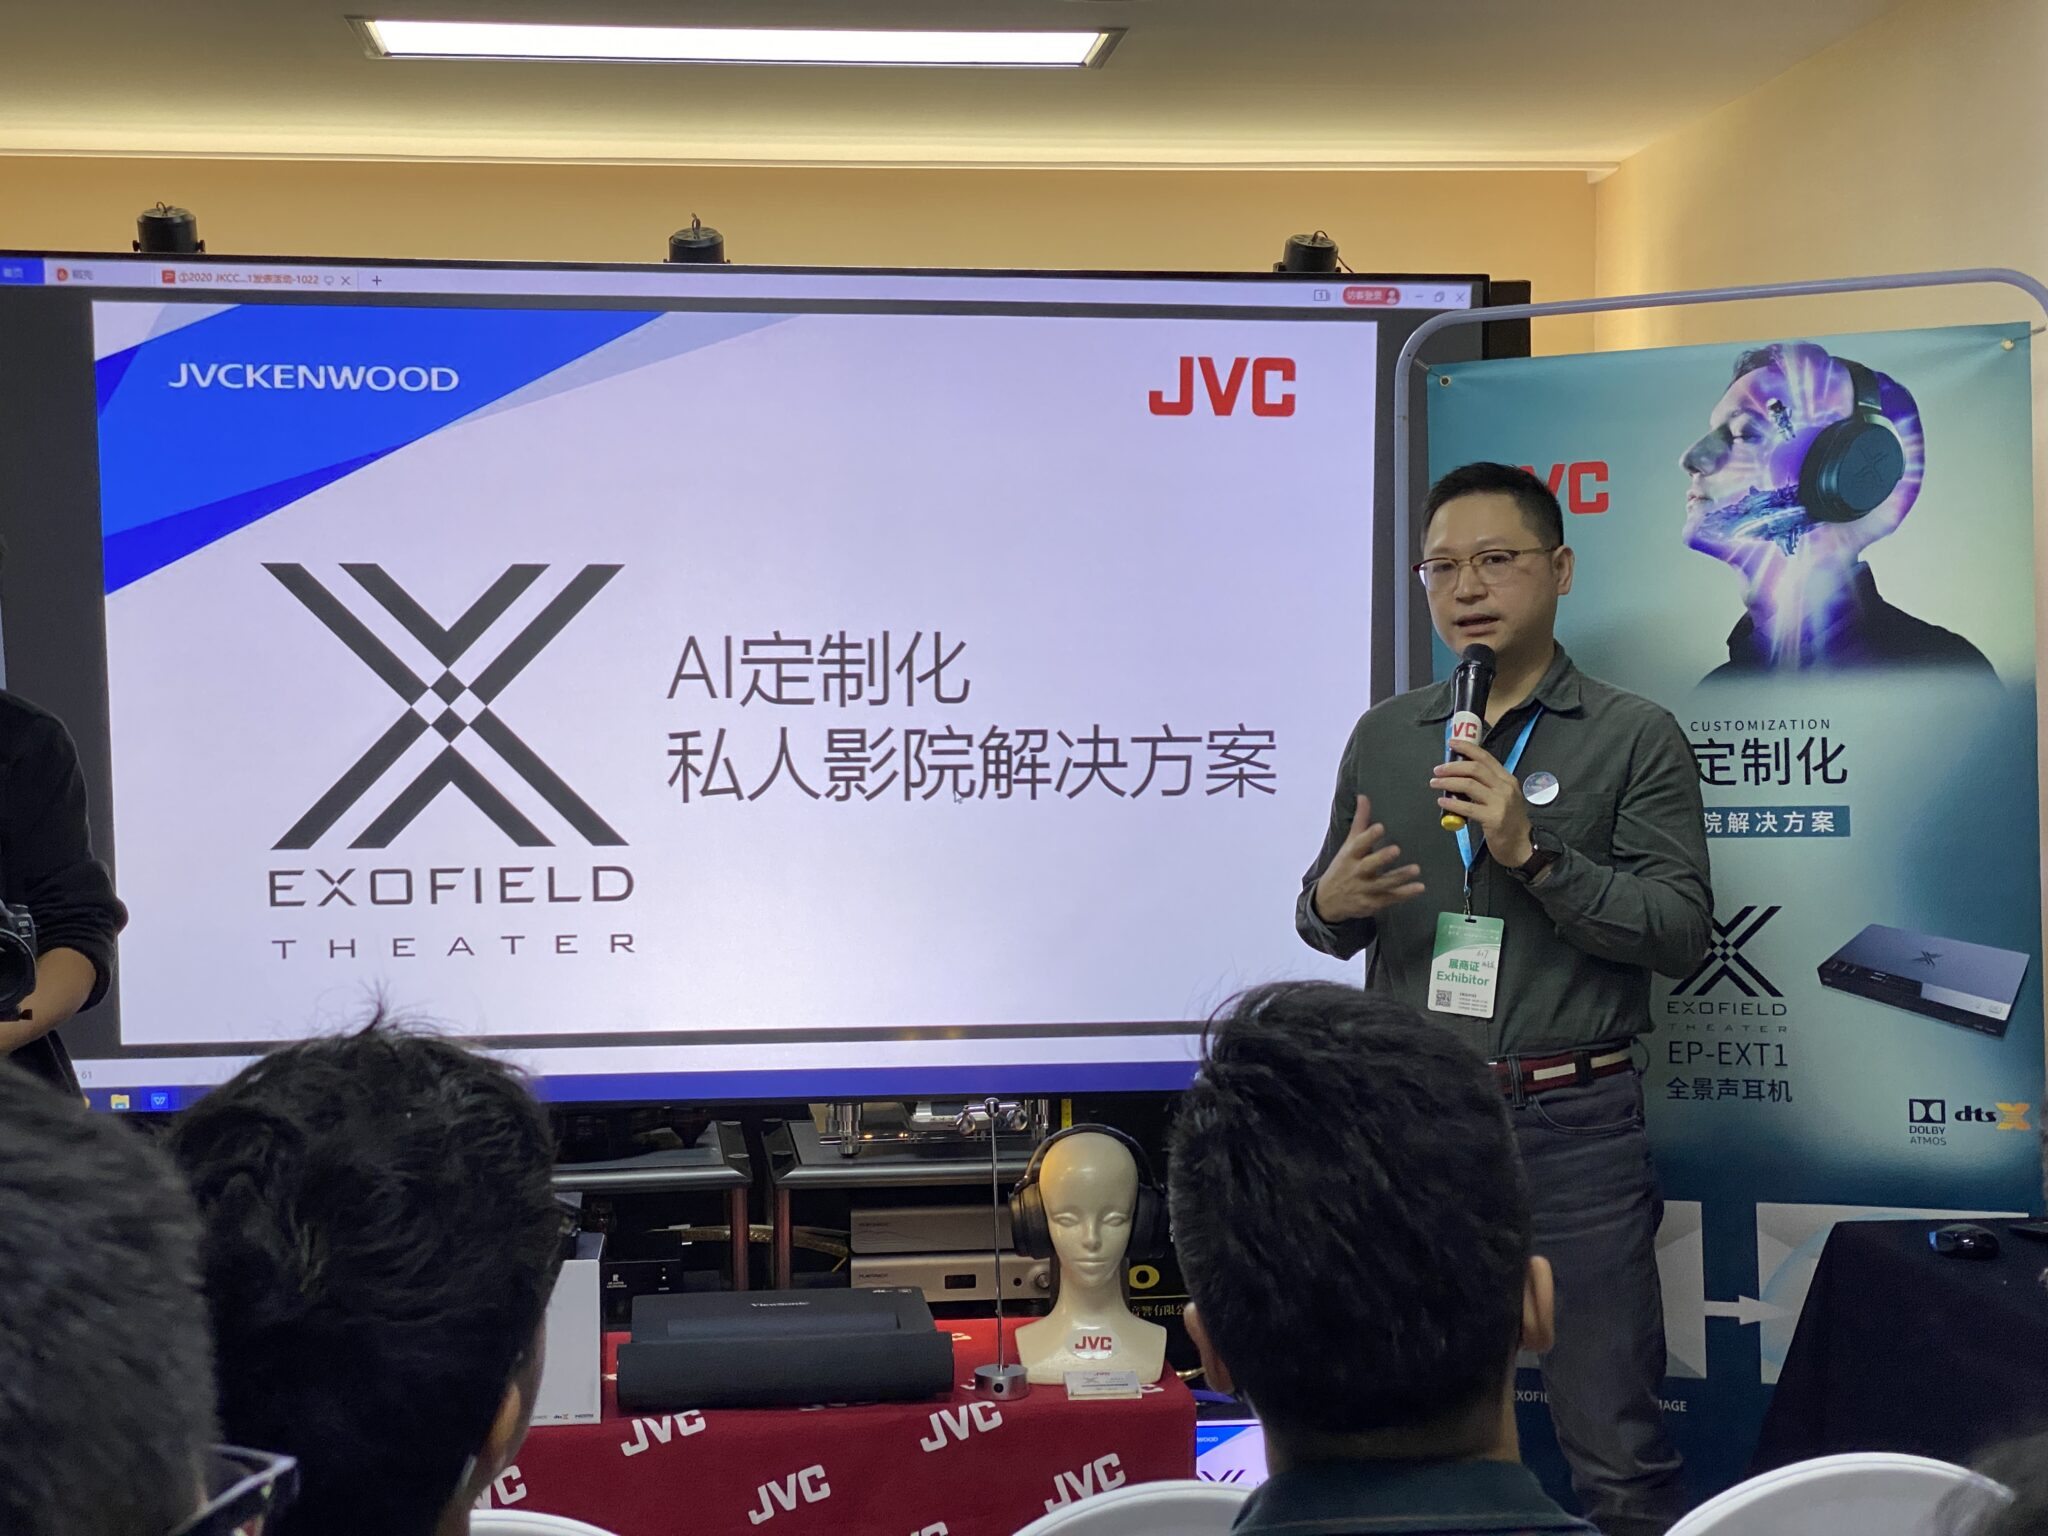 JVC推出AI定制化私人影院解决方案,搭载EXOFIELD声场定位技术-视听圈